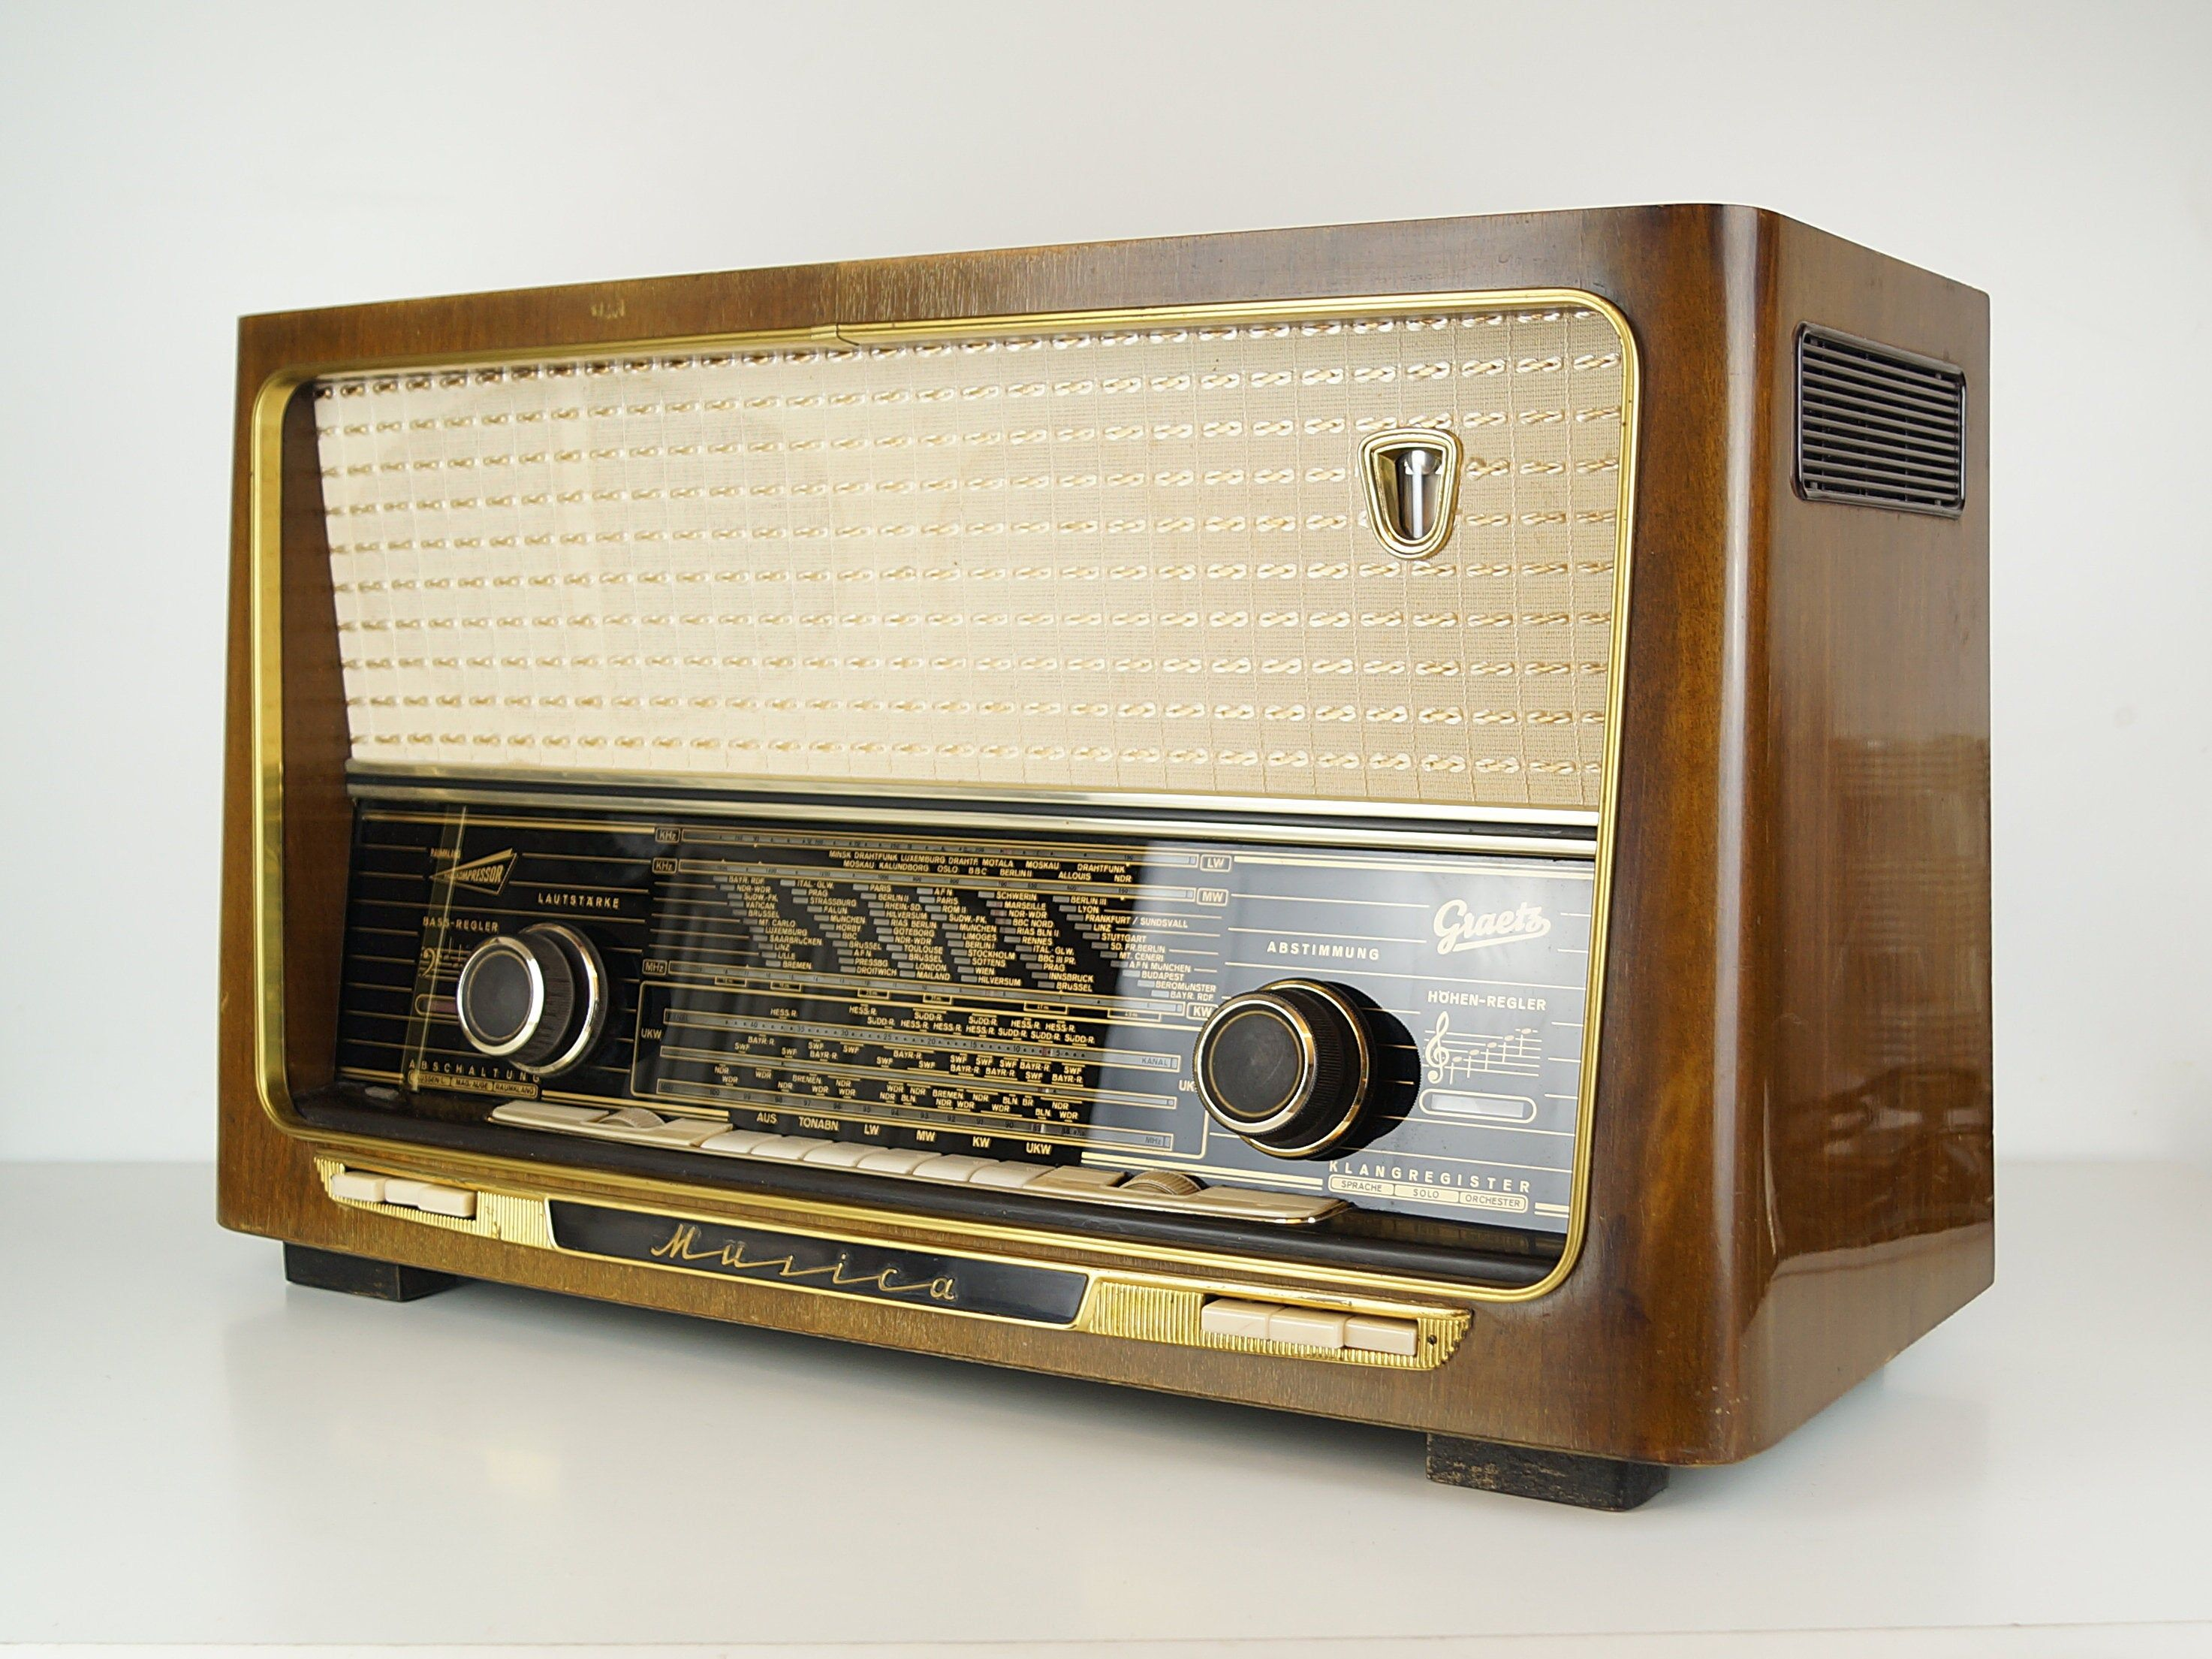 High Quality Tube Radio Graetz Musica W Germany 50s In 2020 Vintage Radio Antique Radio Old Radios